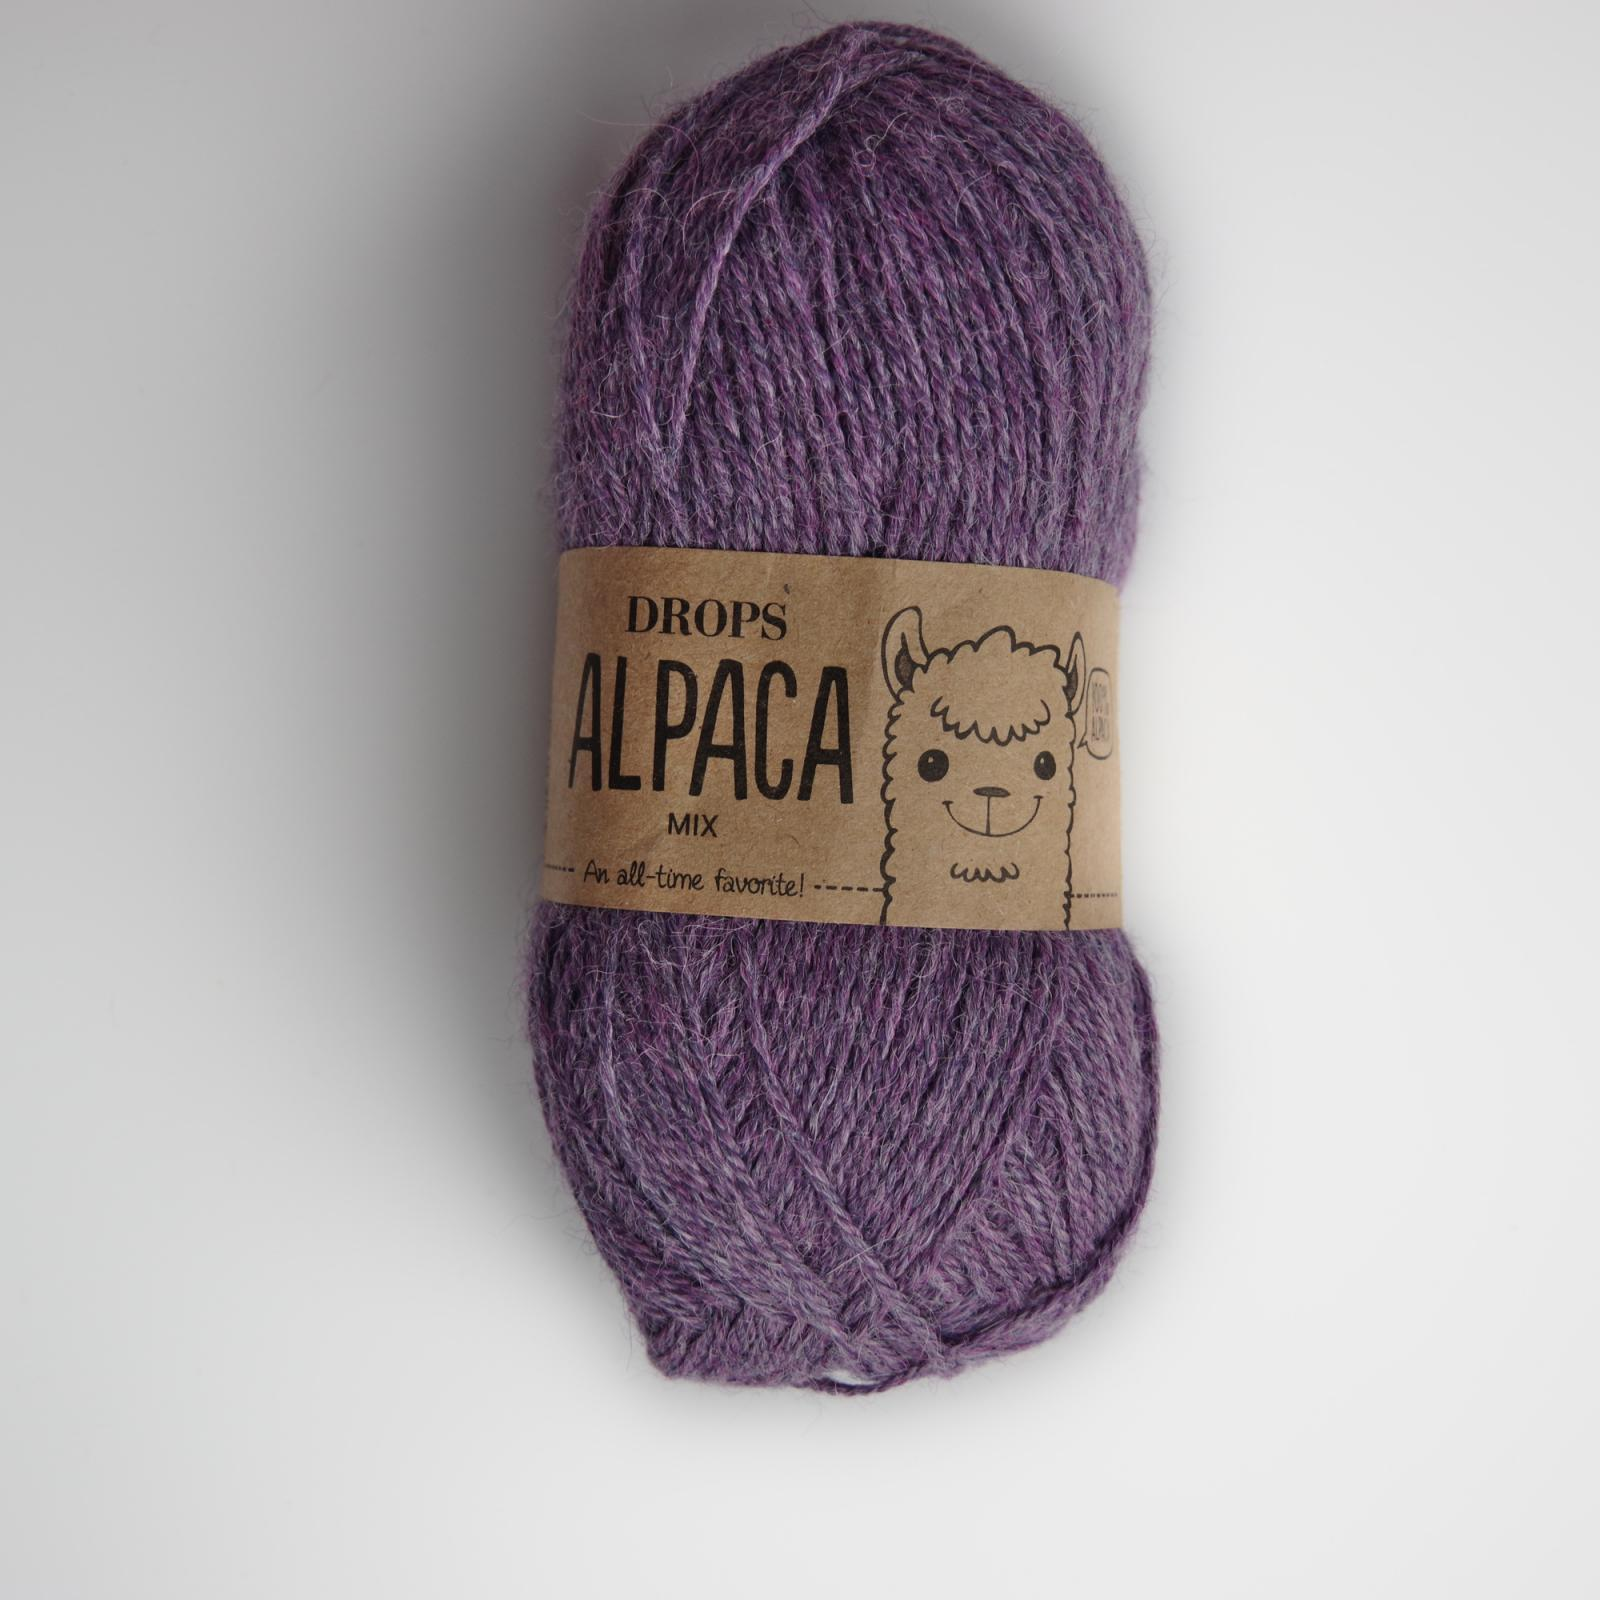 Alpaca - Mix - 4434 purpurová/fialová